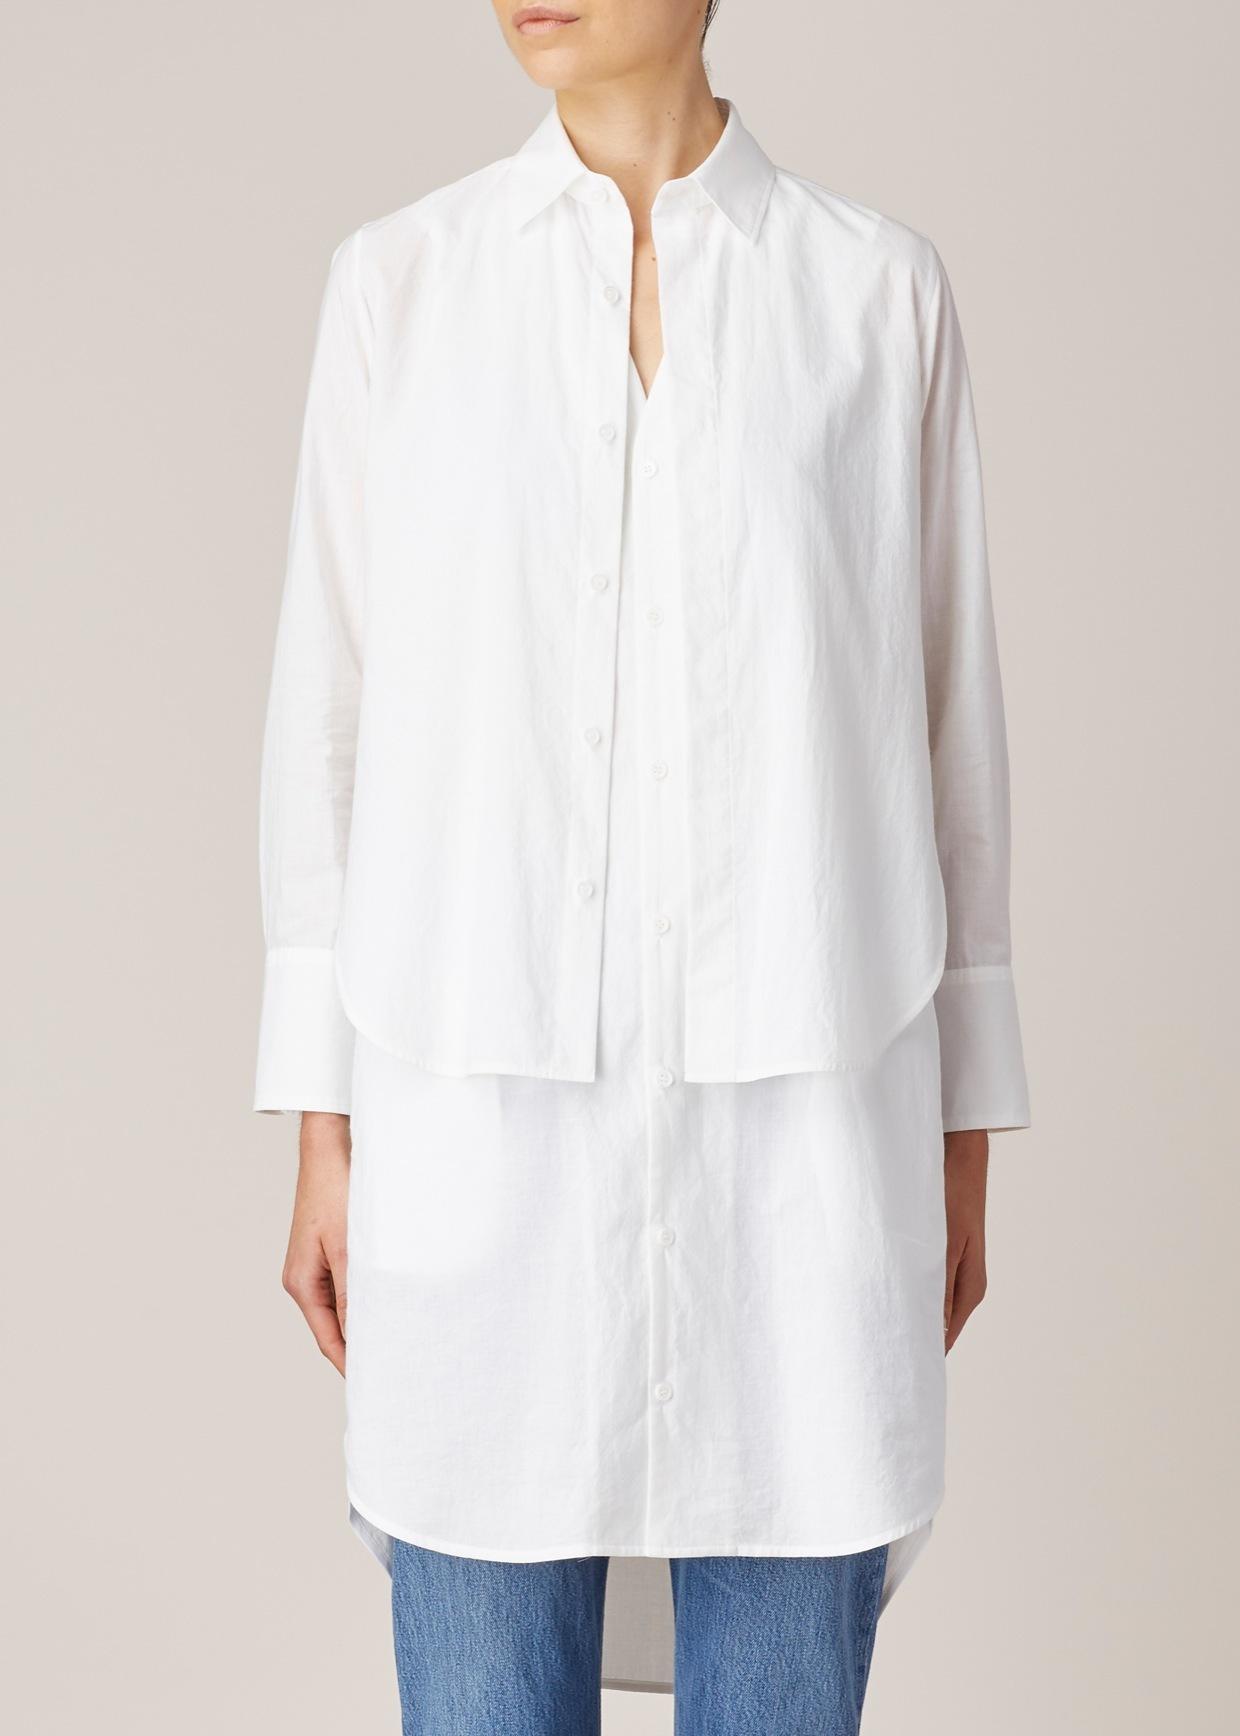 White top Yohji Yamamoto Clearance Buy Enjoy Online kkILvRF